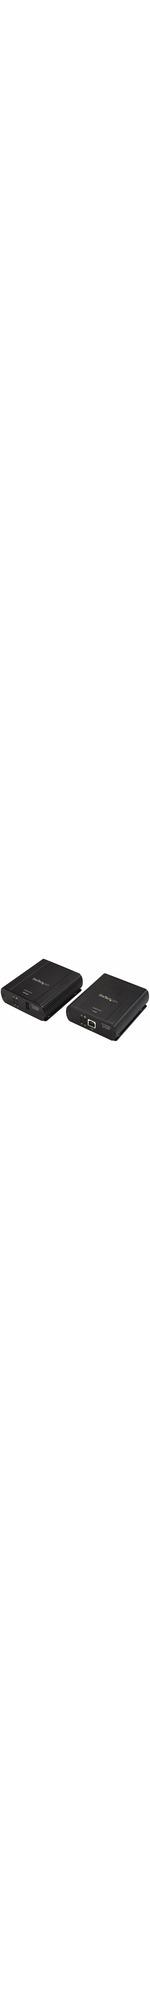 StarTech.com 1 Port USB 2.0 over Cat5 / Cat6 Ethernet Extender - up to 330ft 100m